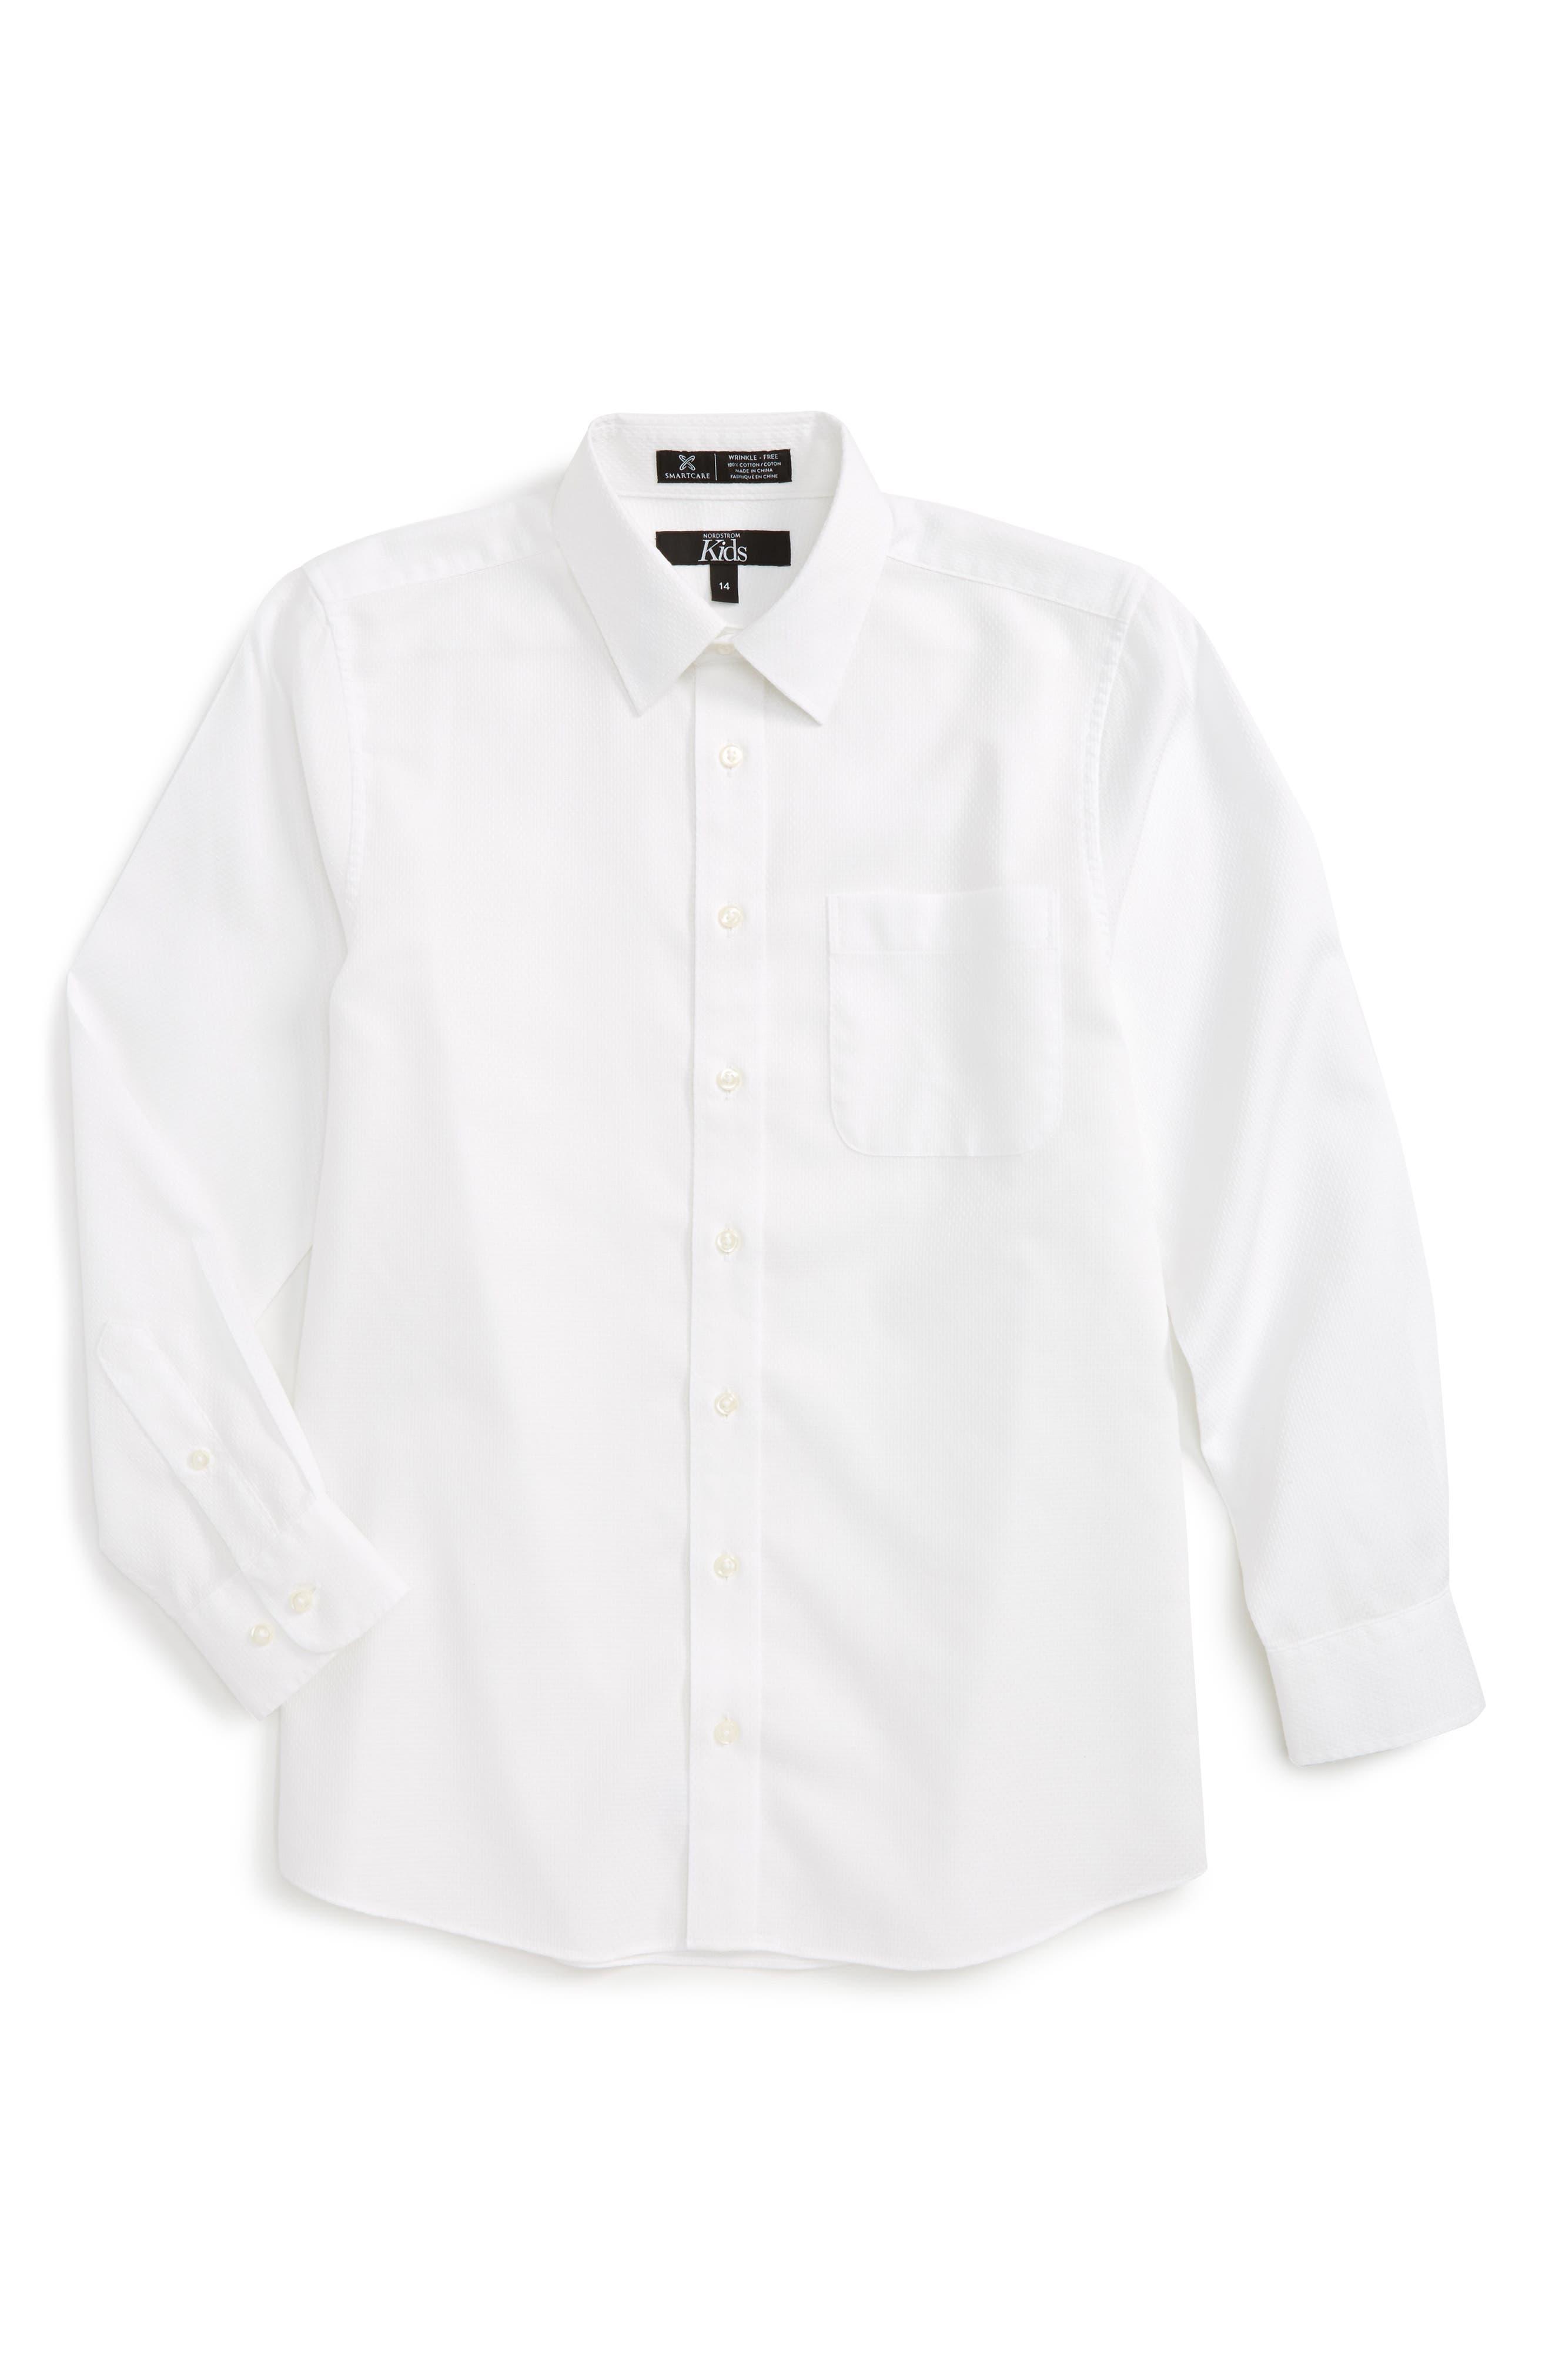 Smartcare<sup>™</sup> Honeycomb Dress Shirt,                             Main thumbnail 1, color,                             100